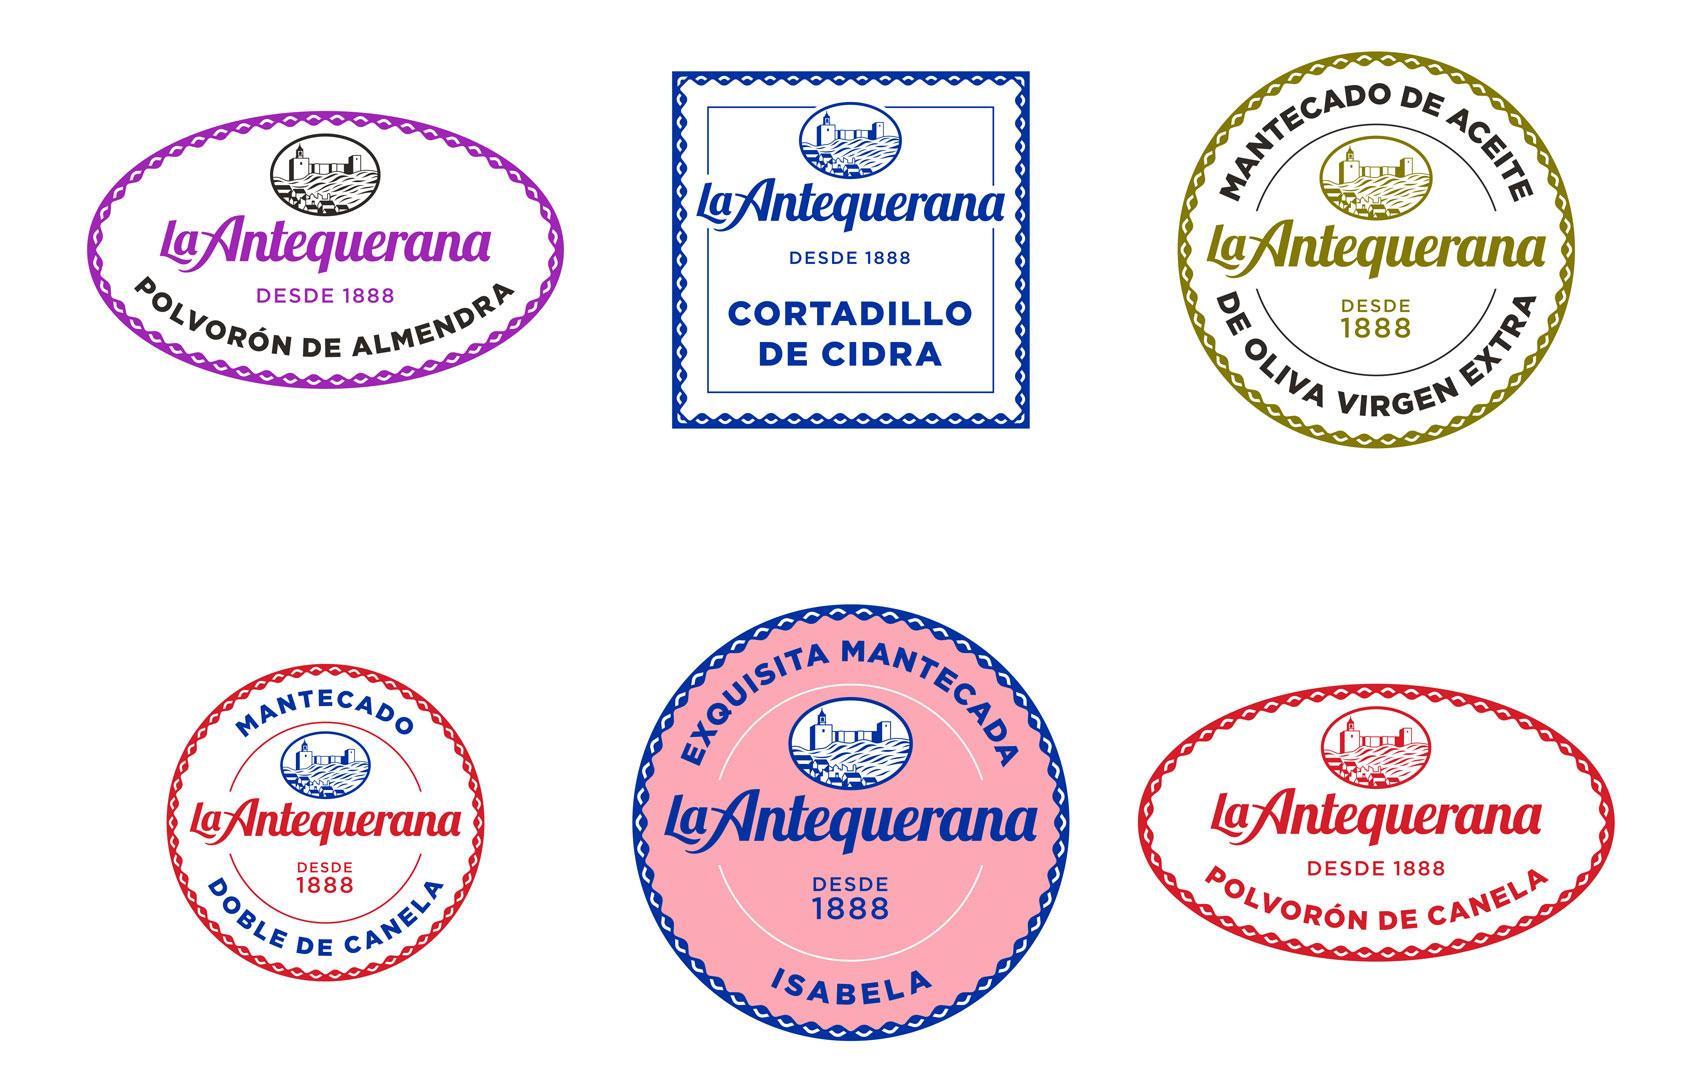 ident-lanatequerana-02.jpg